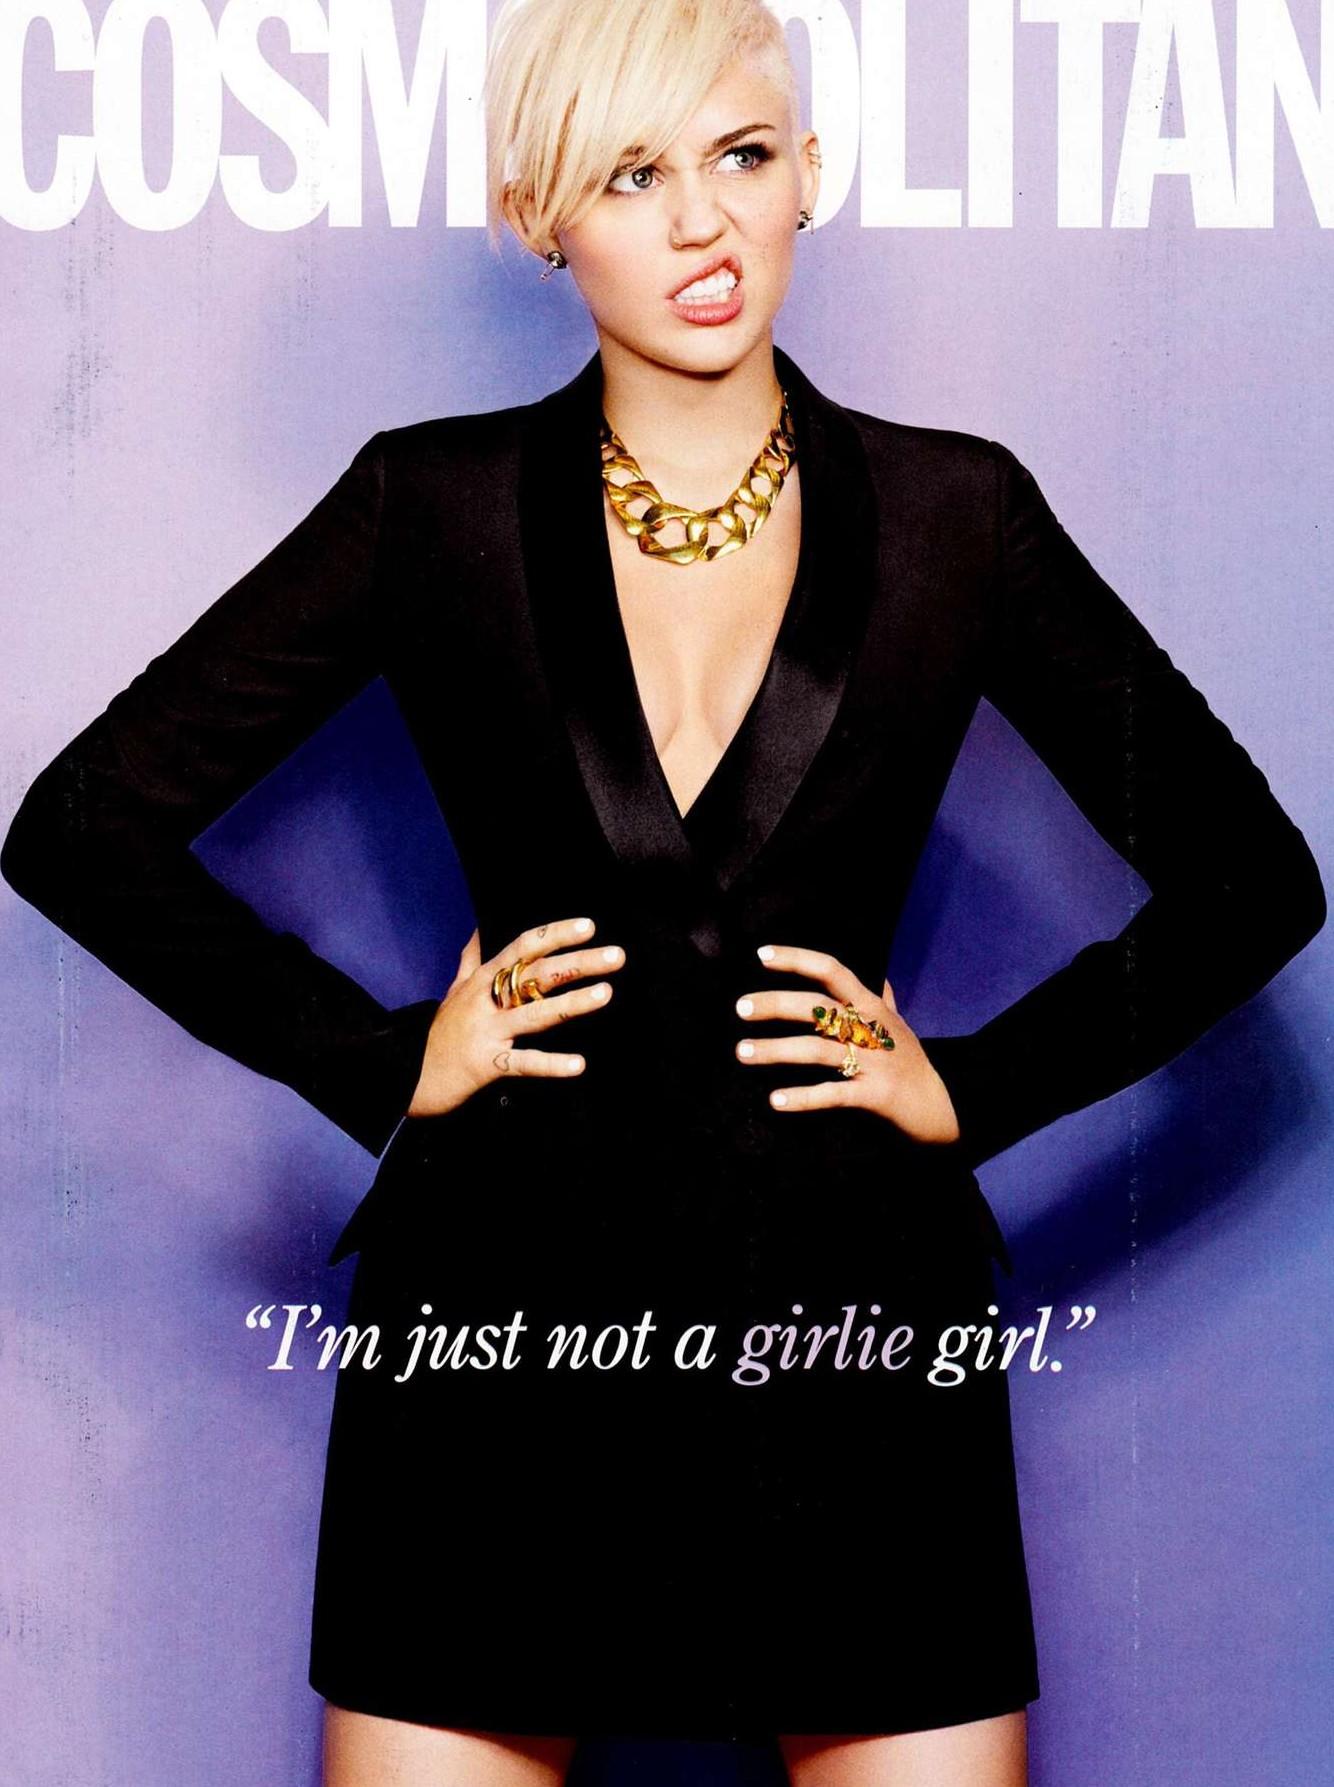 Miley Cyrus in Cosmopolitan Magazine (March 2013) issue